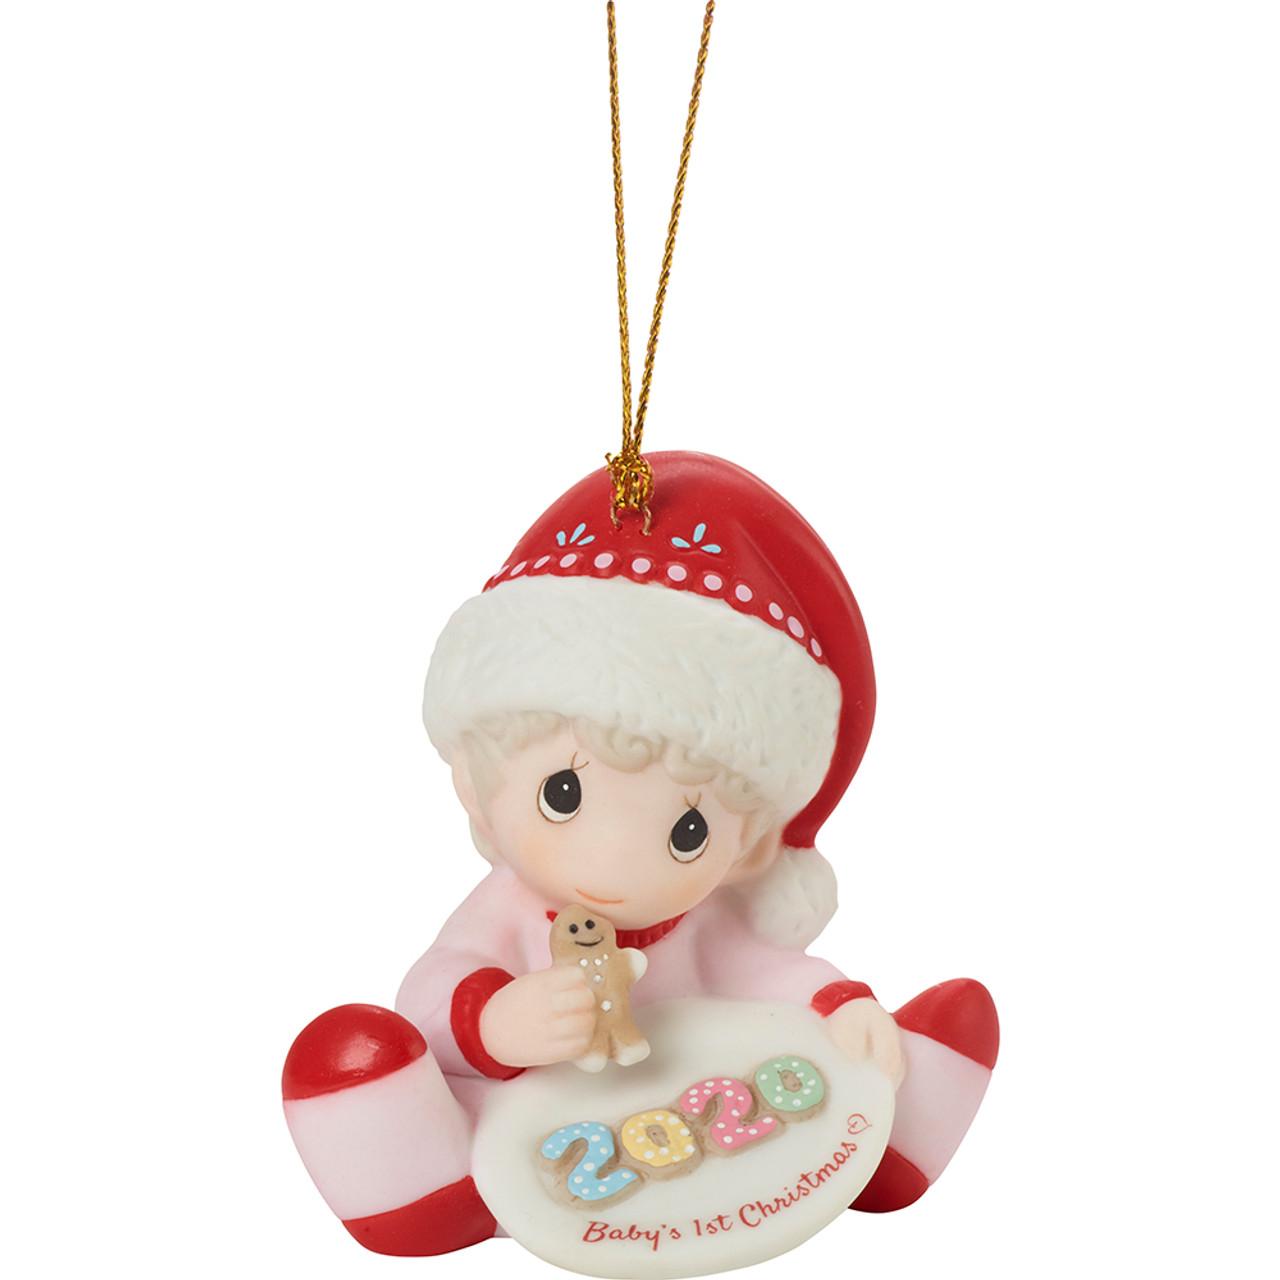 $ New PRECIOUS MOMENTS Porcelain Figurine 2020 CHRISTMAS DATED Bunny Santa Girl